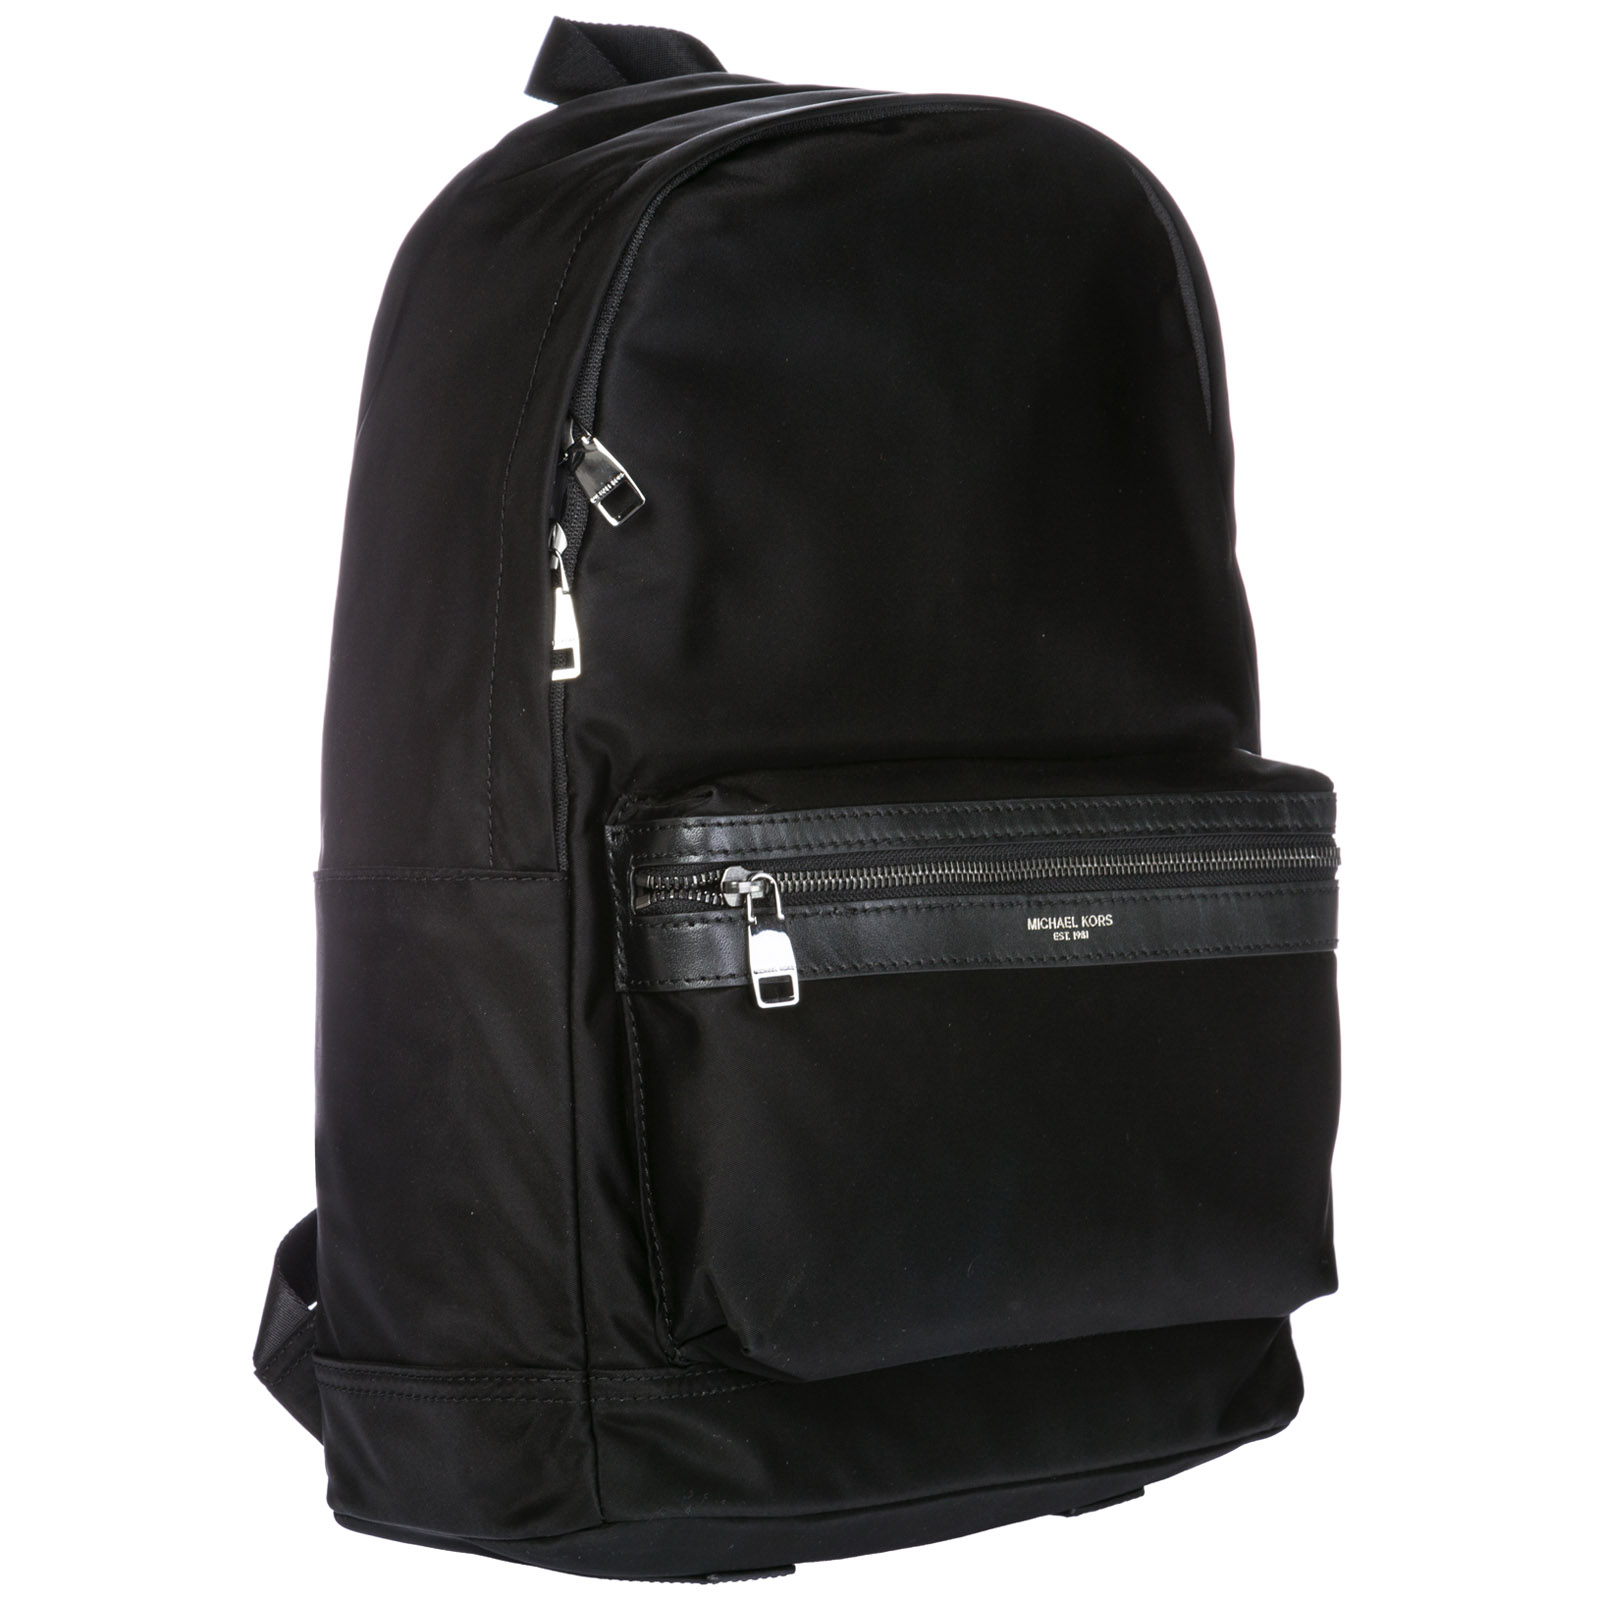 15d07b0c4b4d Backpack Michael Kors Kent 33F5LKNB2C 001 black   FRMODA.com